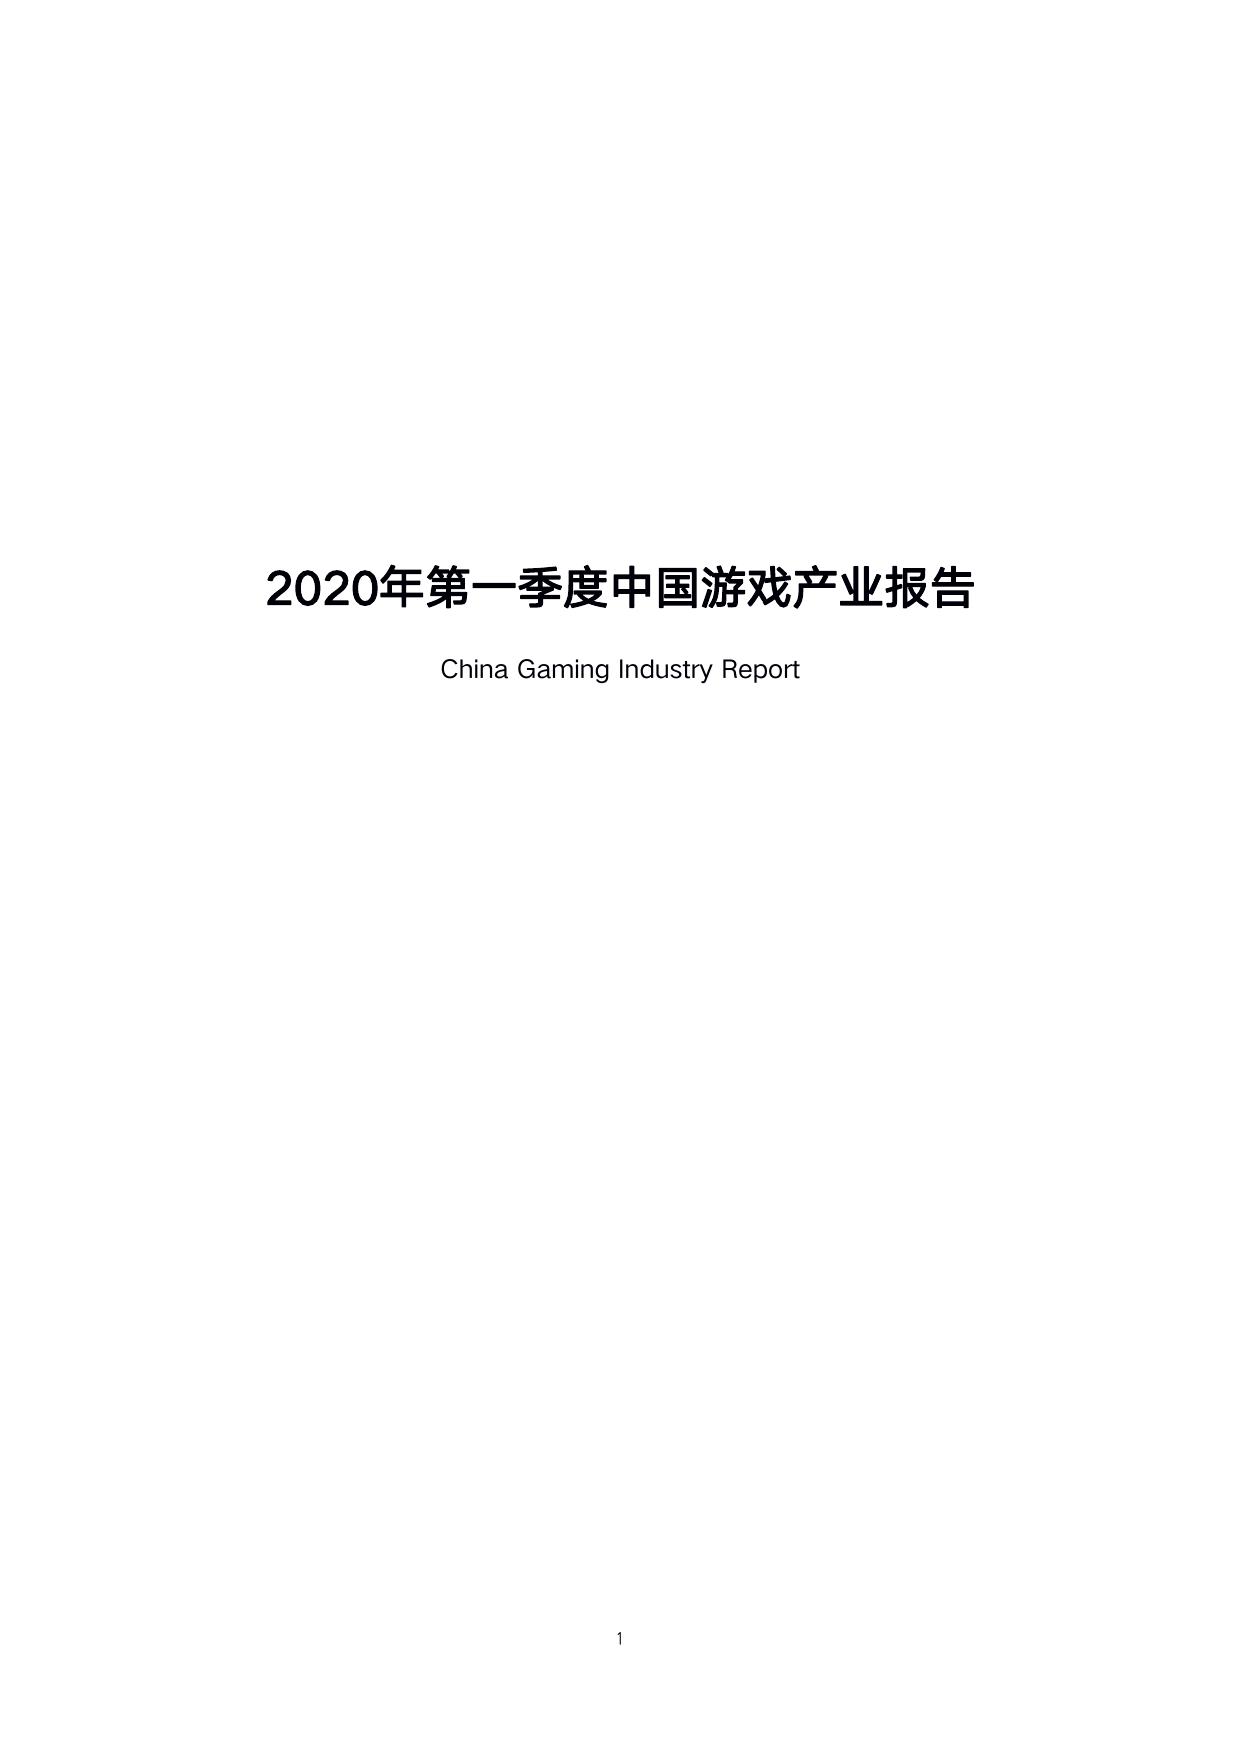 GPC:2020第一季度中国游戏产业报告(附下载)